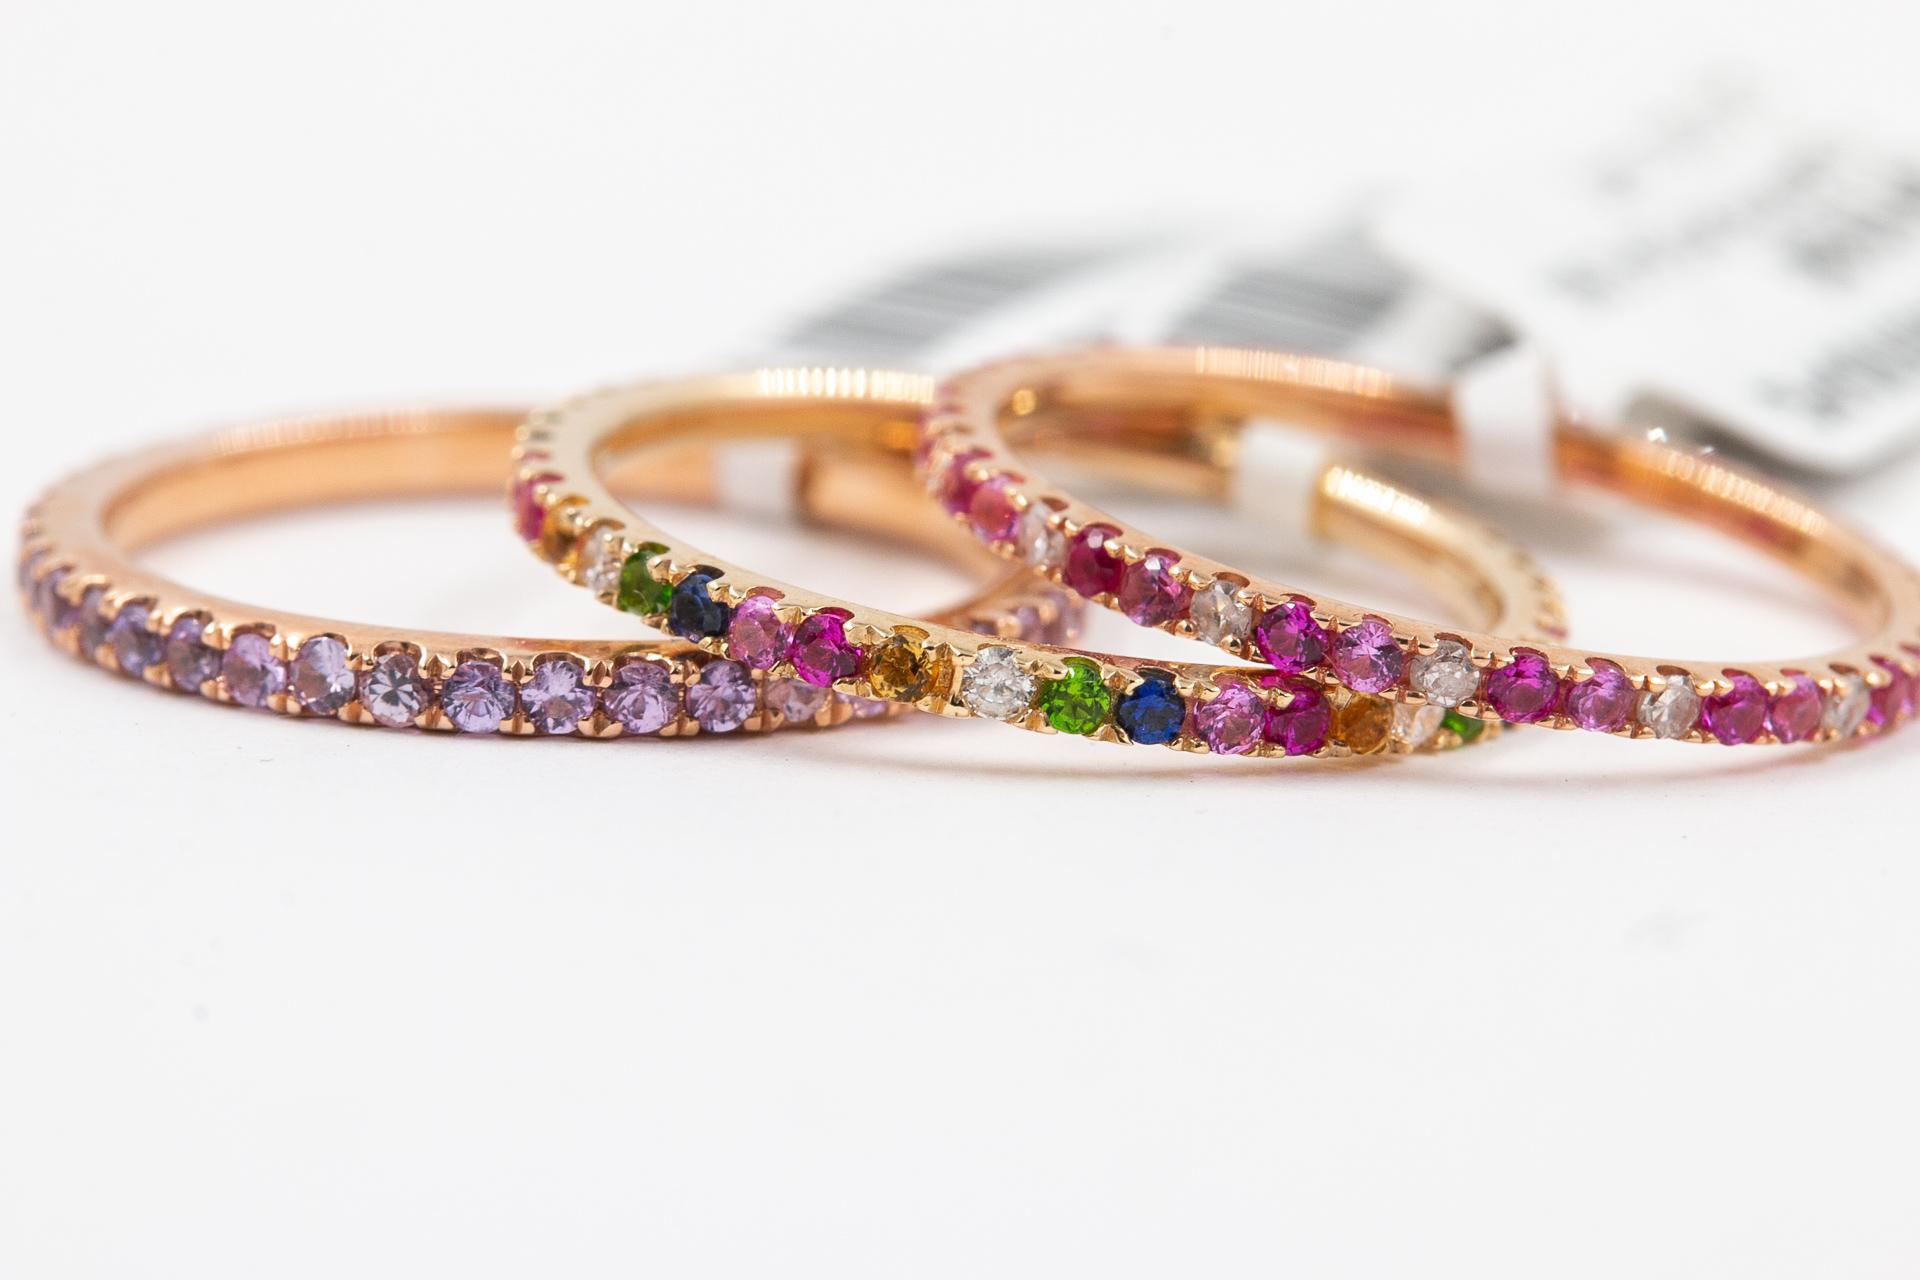 sapphire-fashion-jewelry-ring-2